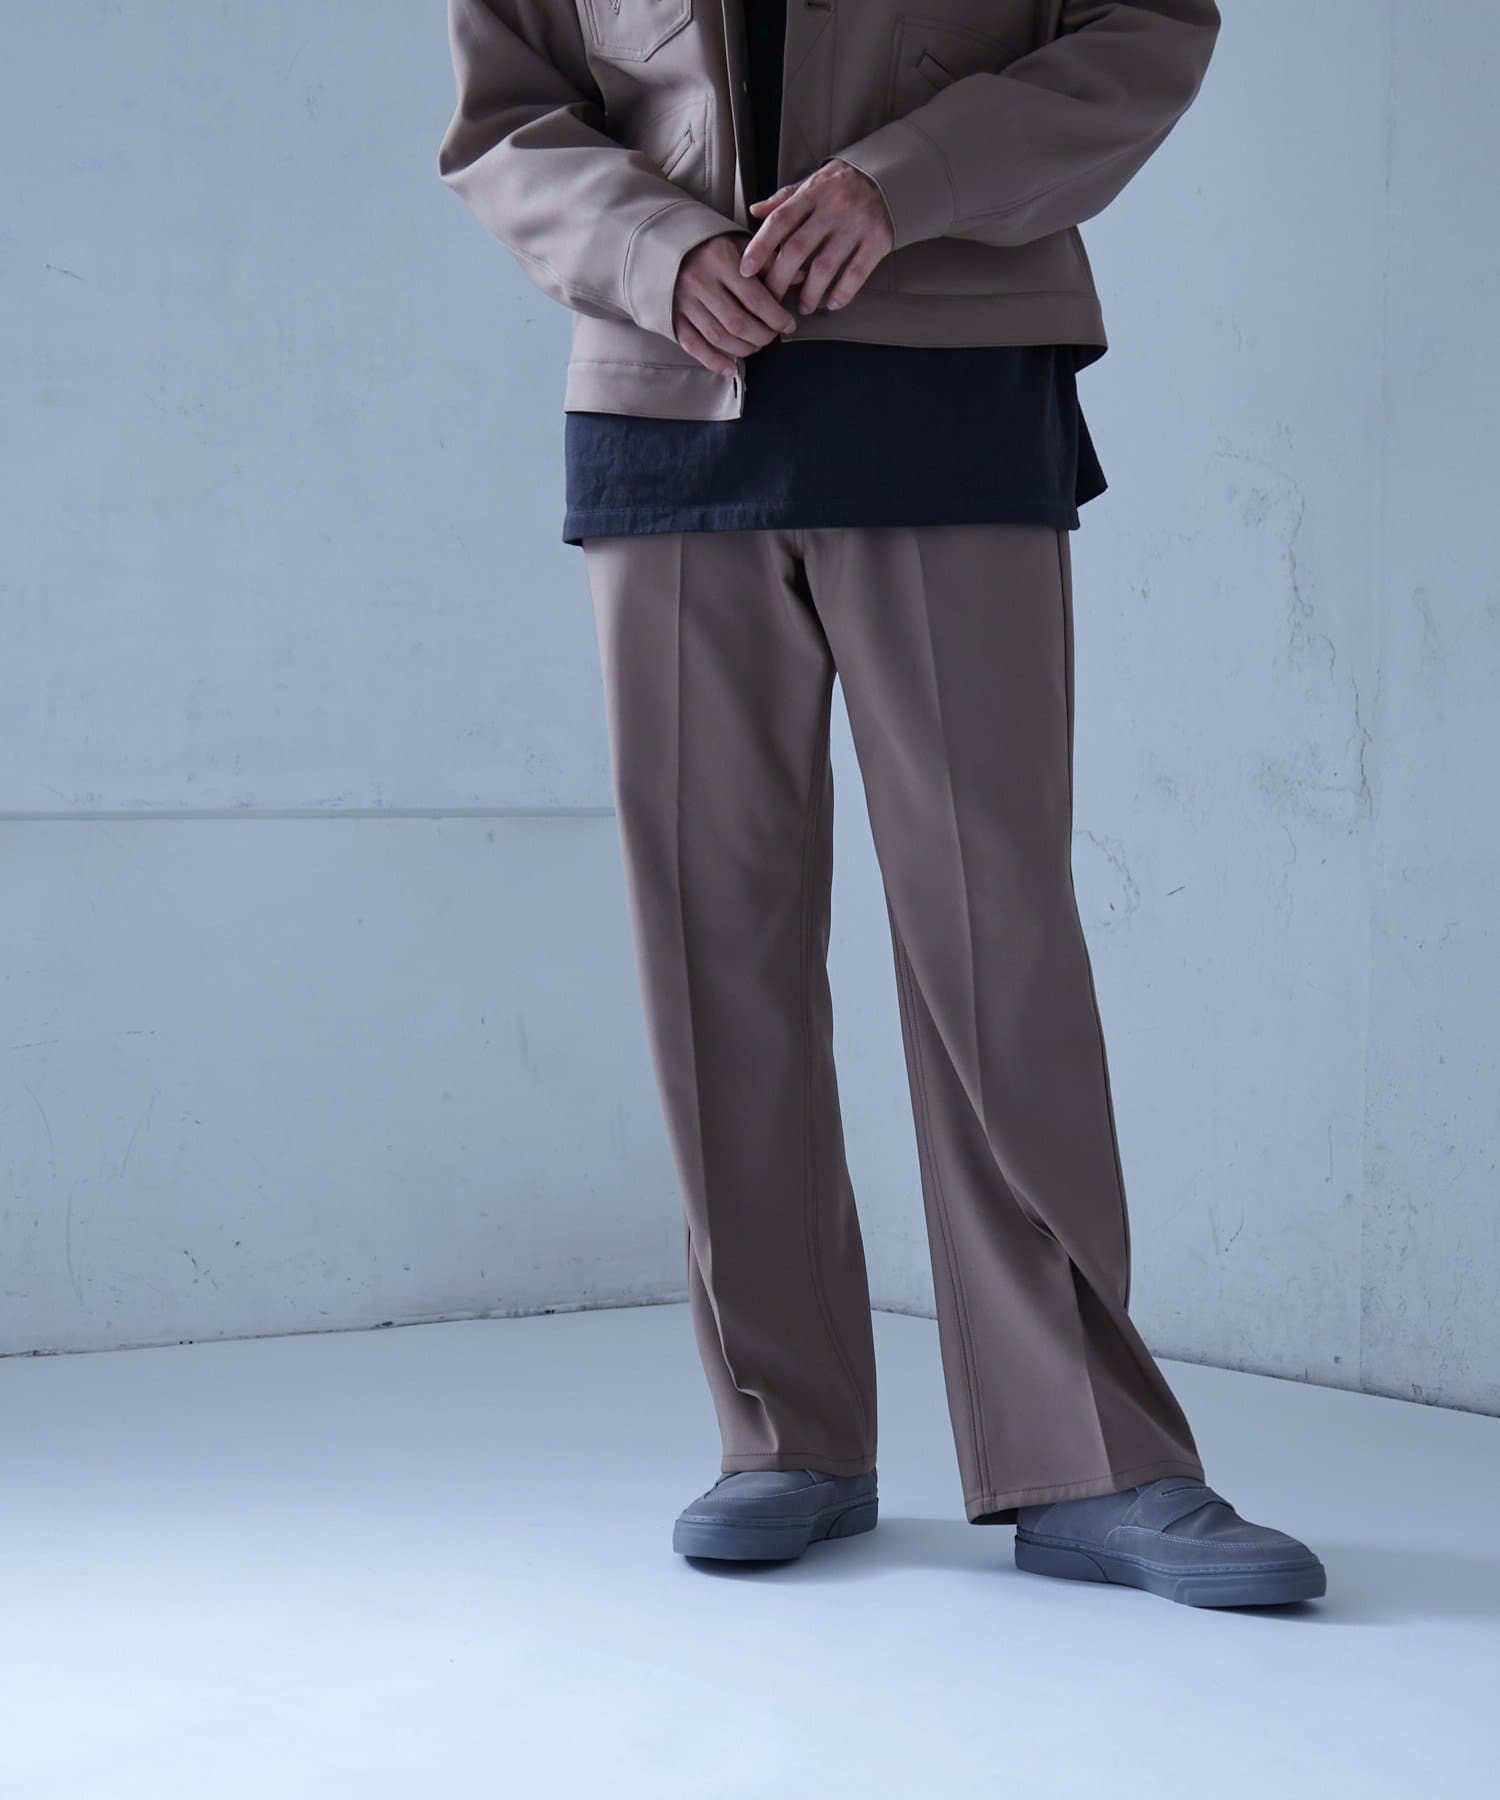 Discoat(ディスコート) メンズ 【Wrangler/ラングラー】 WRANCHER DRESS ベージュ